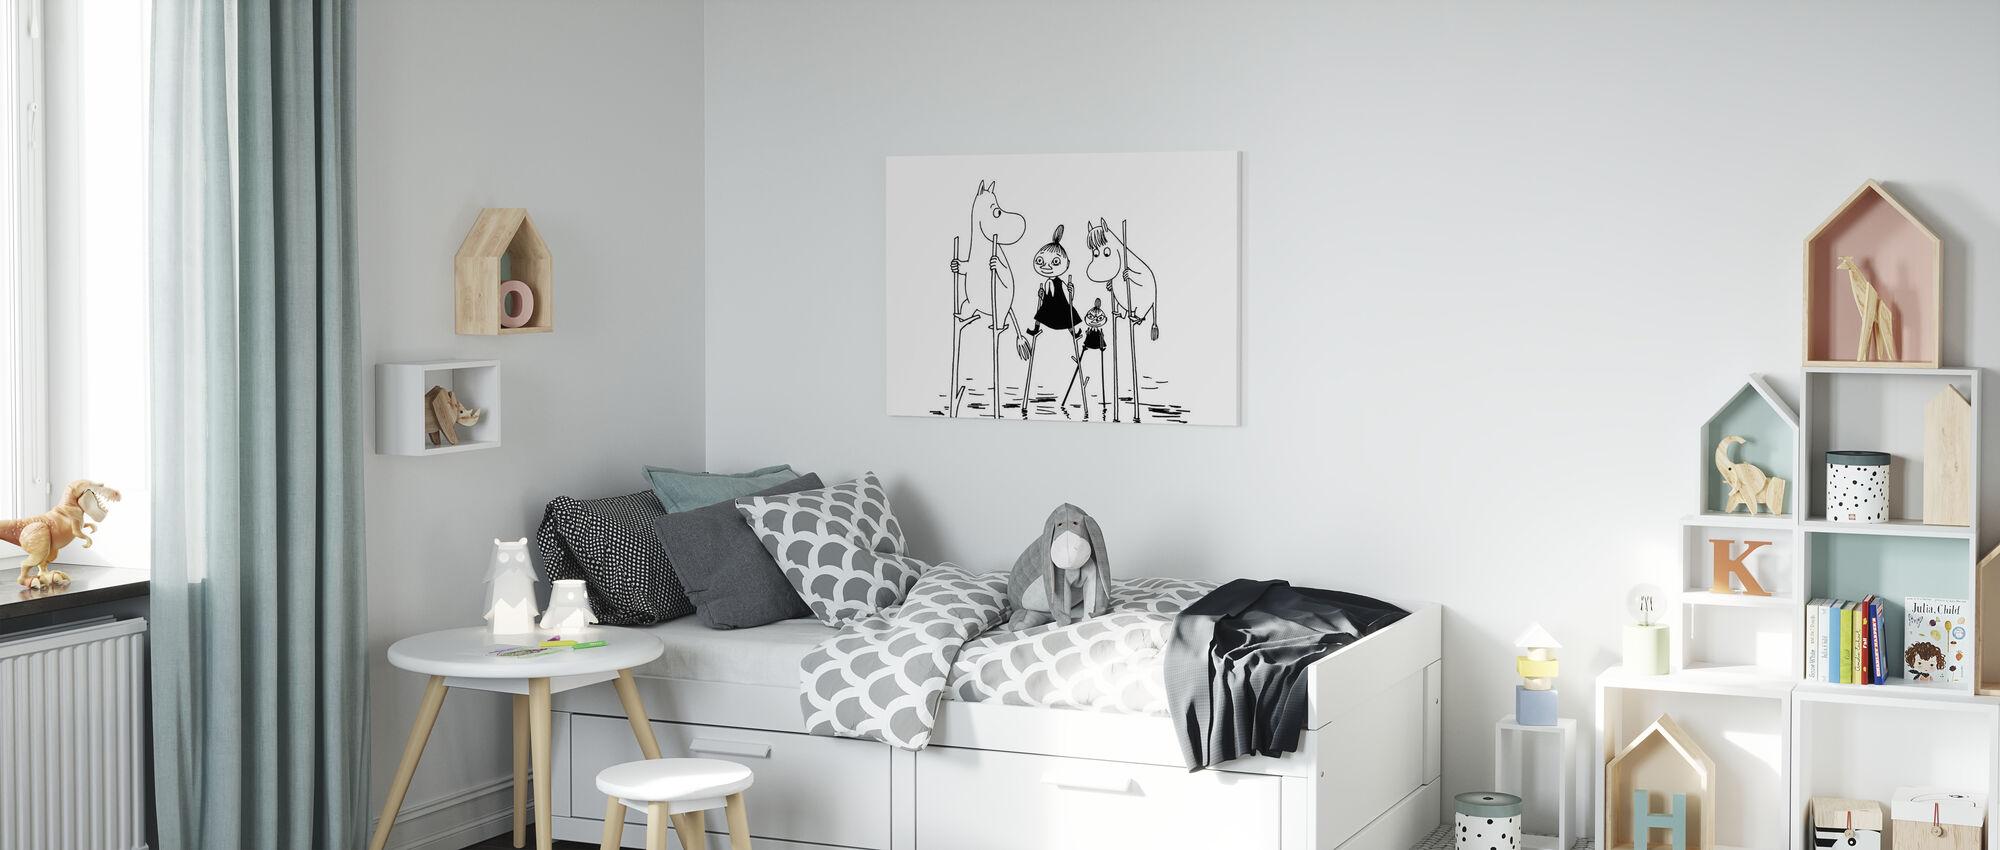 Moomin - Treasures Lost at Sea - Canvas print - Kids Room